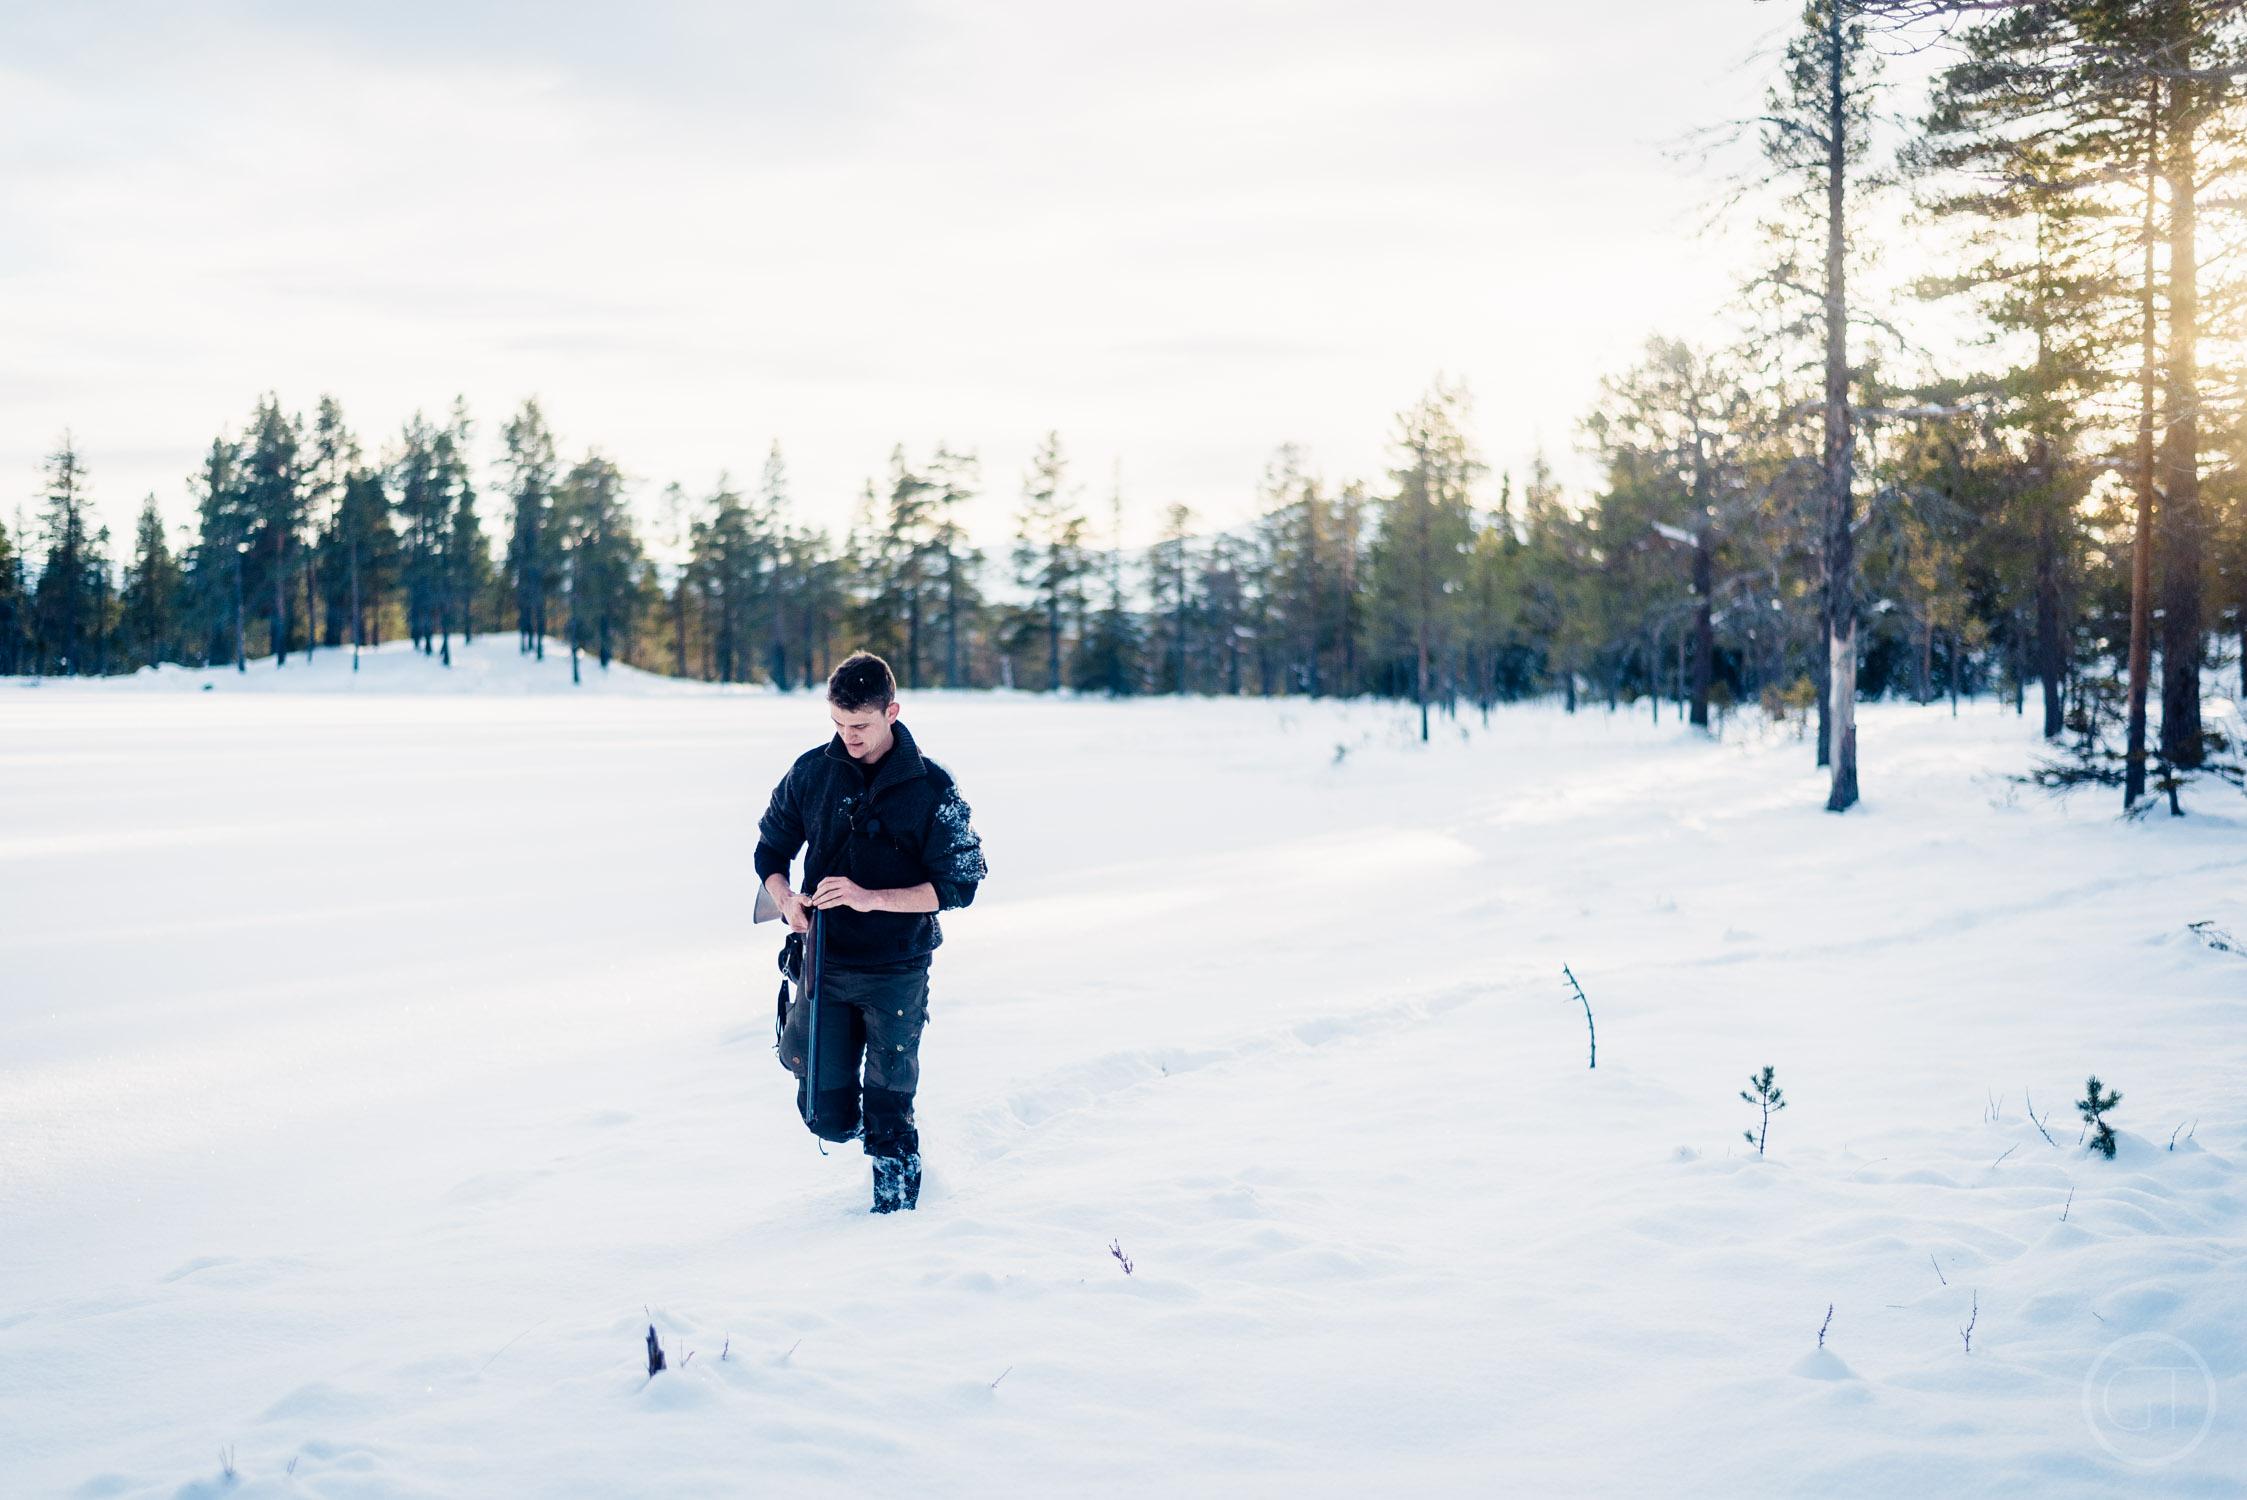 GUSTAV_THUESEN_HUNTING_NORWAY_OUTDOOR_LIFESTYLE_PHOTOGRAPHER_PROFESSIONAL-17.jpg